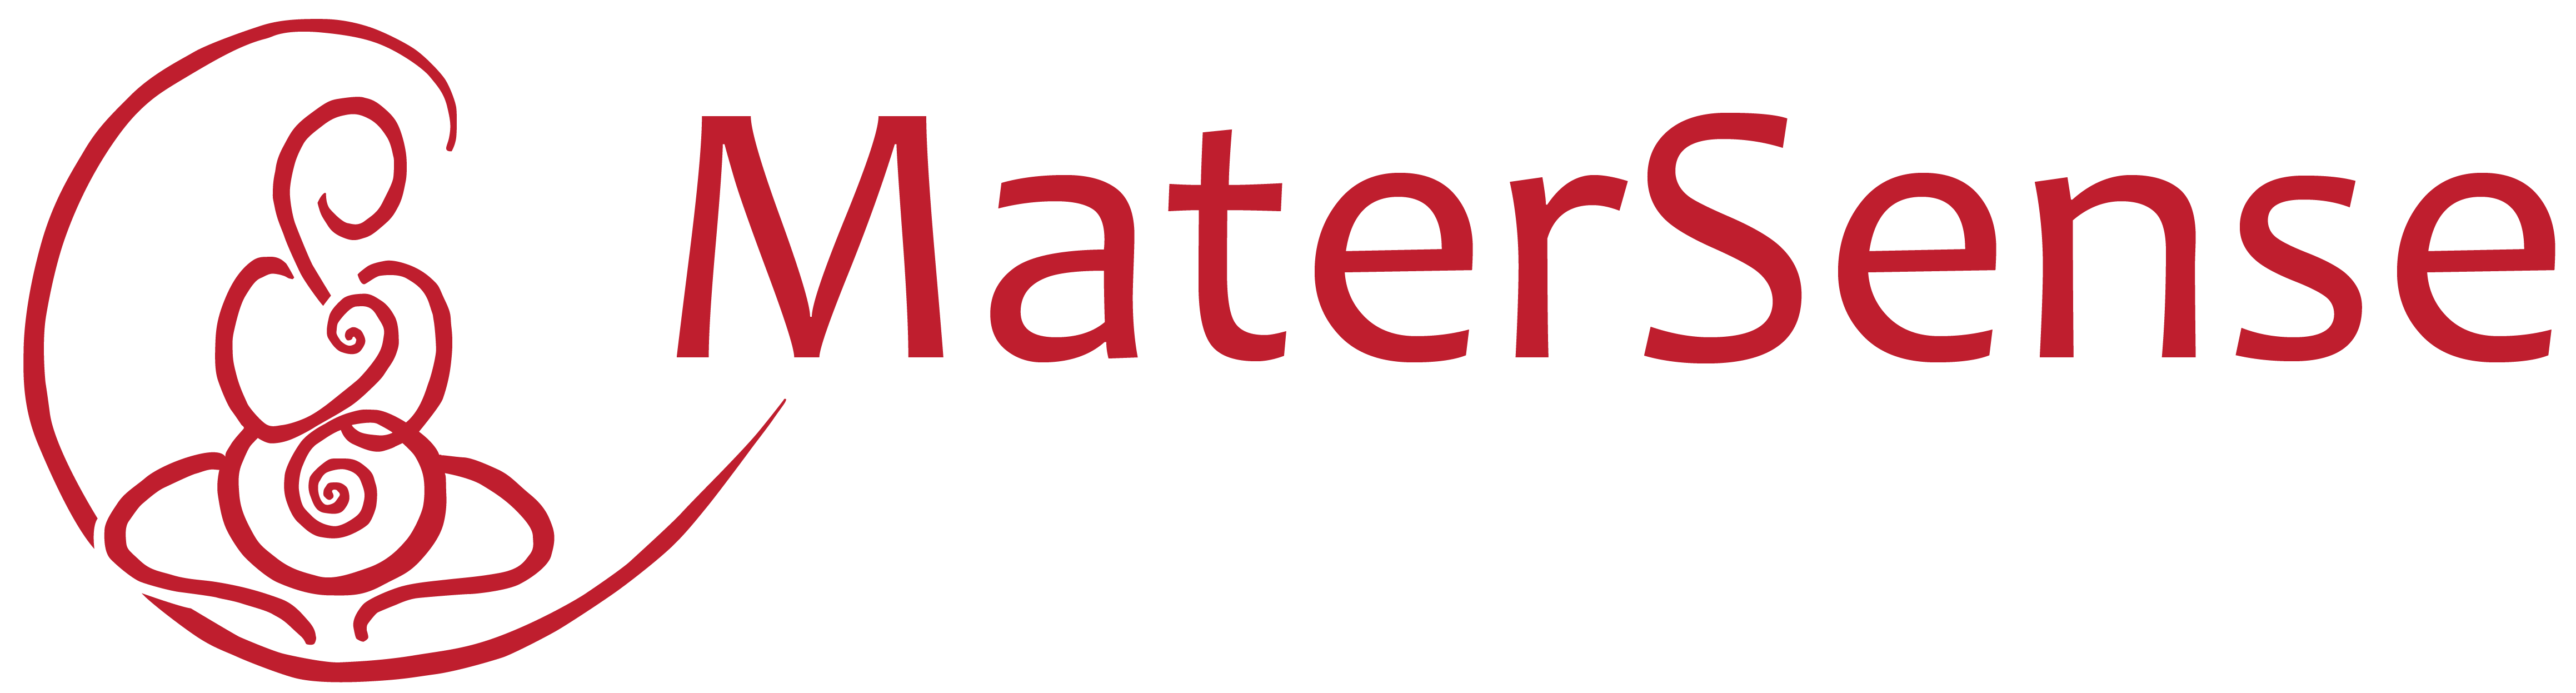 Matersense